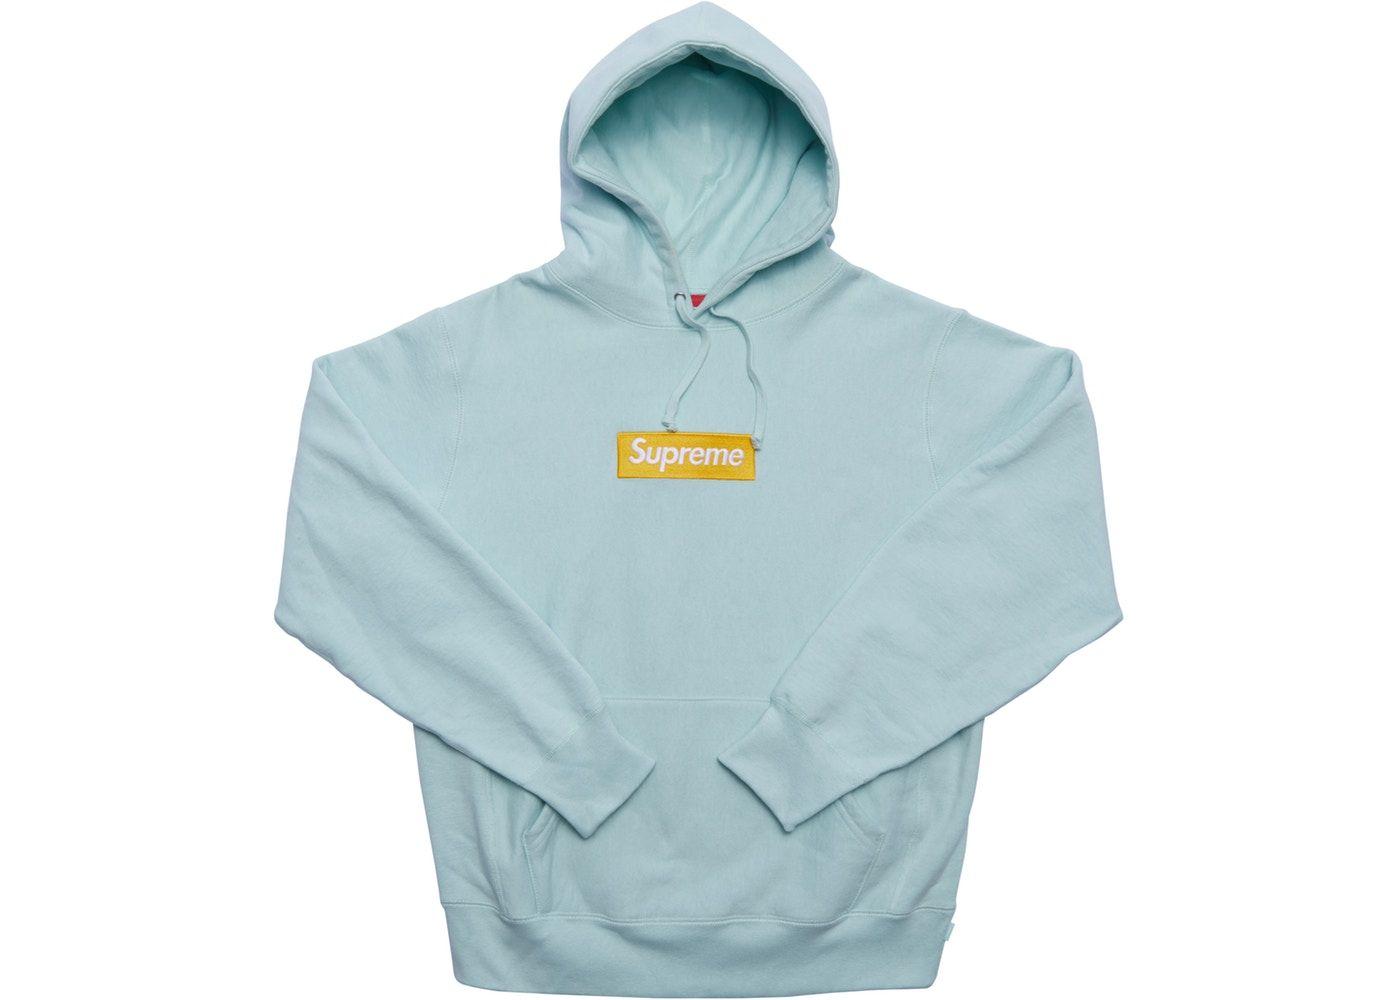 Supreme Box Logo Hooded Sweatshirt Fw17 Ice Blue In 2021 Hooded Sweatshirts Supreme Hoodie Sweatshirts [ 1000 x 1400 Pixel ]